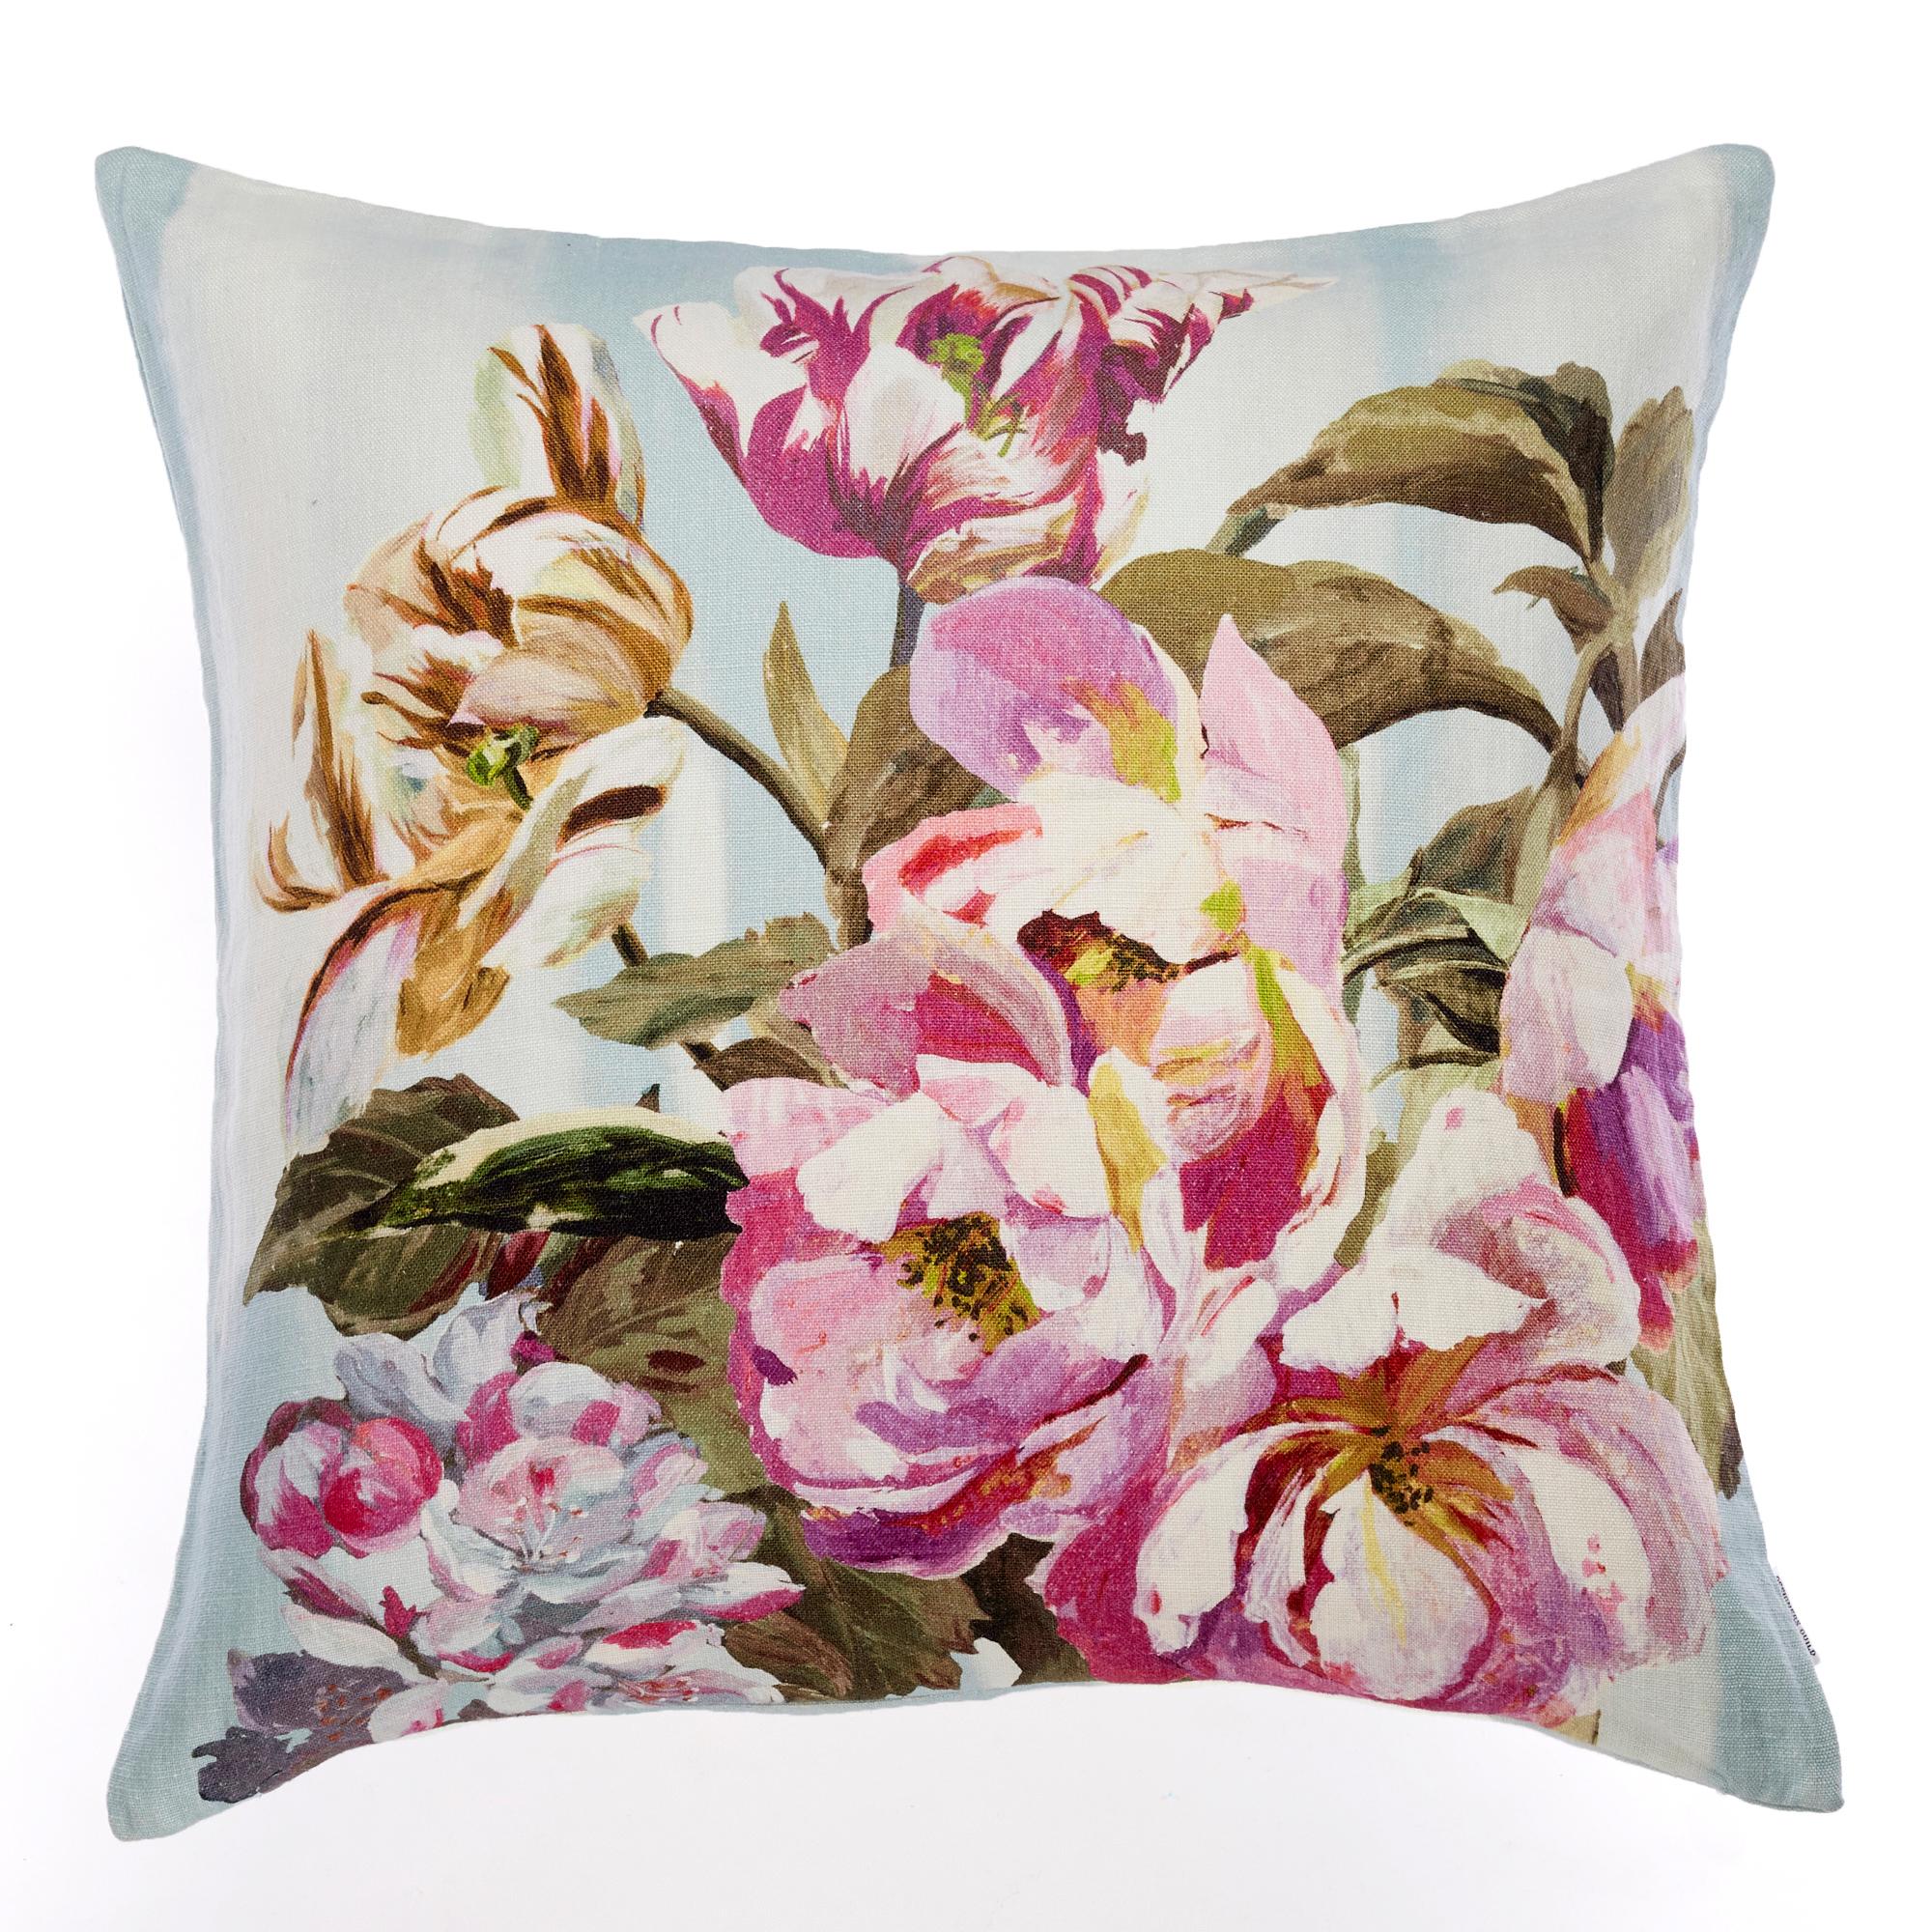 Designers Guild Garden Pillow Pink Floral Gumps